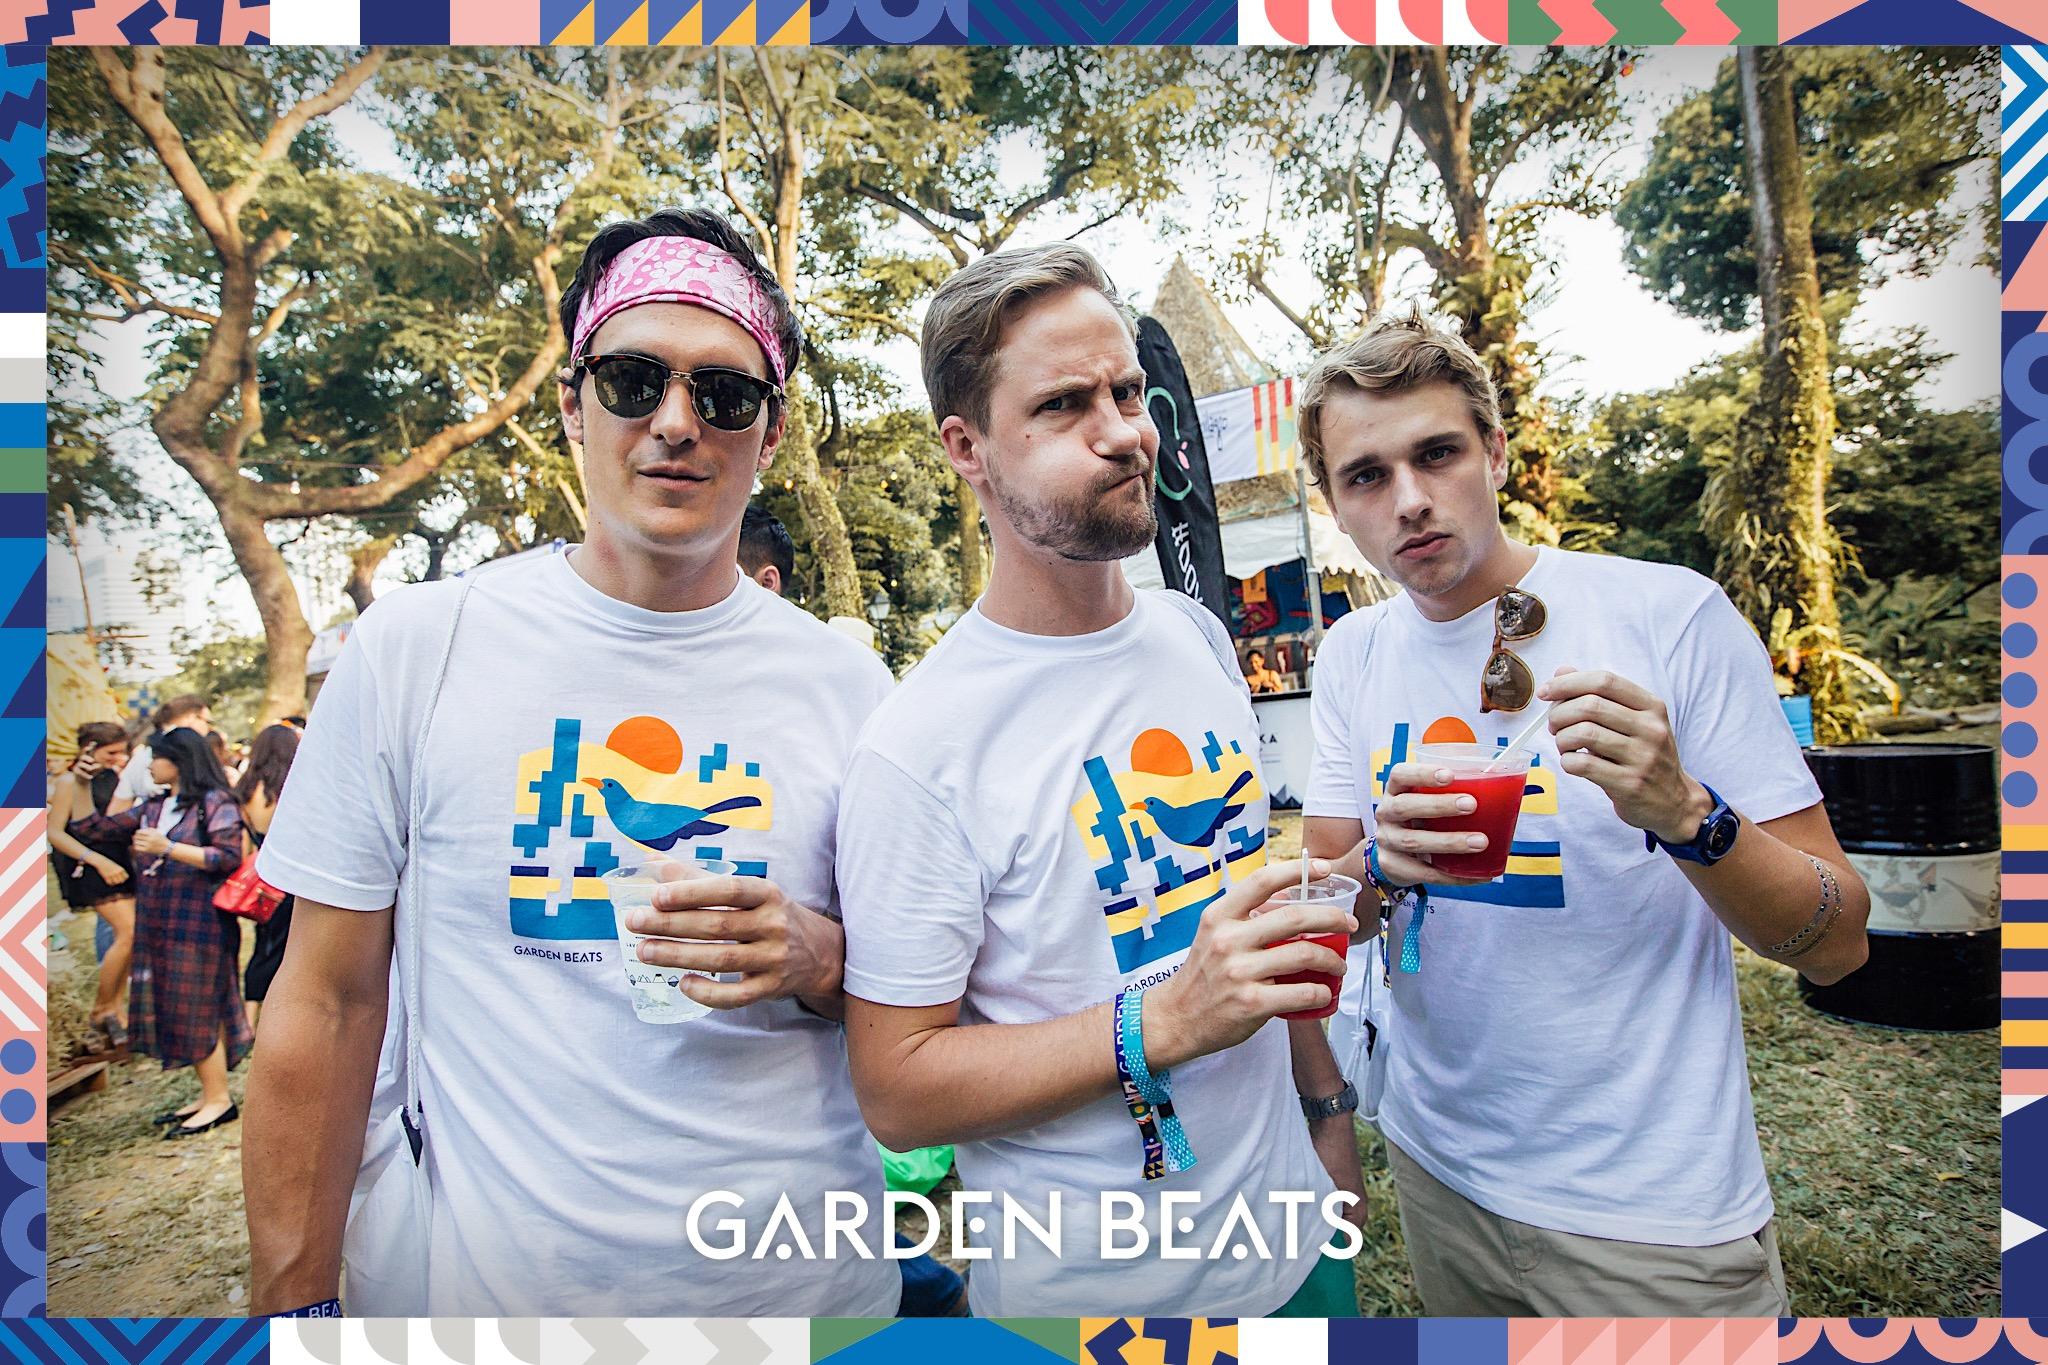 18032017_GardenBeats_Colossal525_WatermarkedGB.jpg